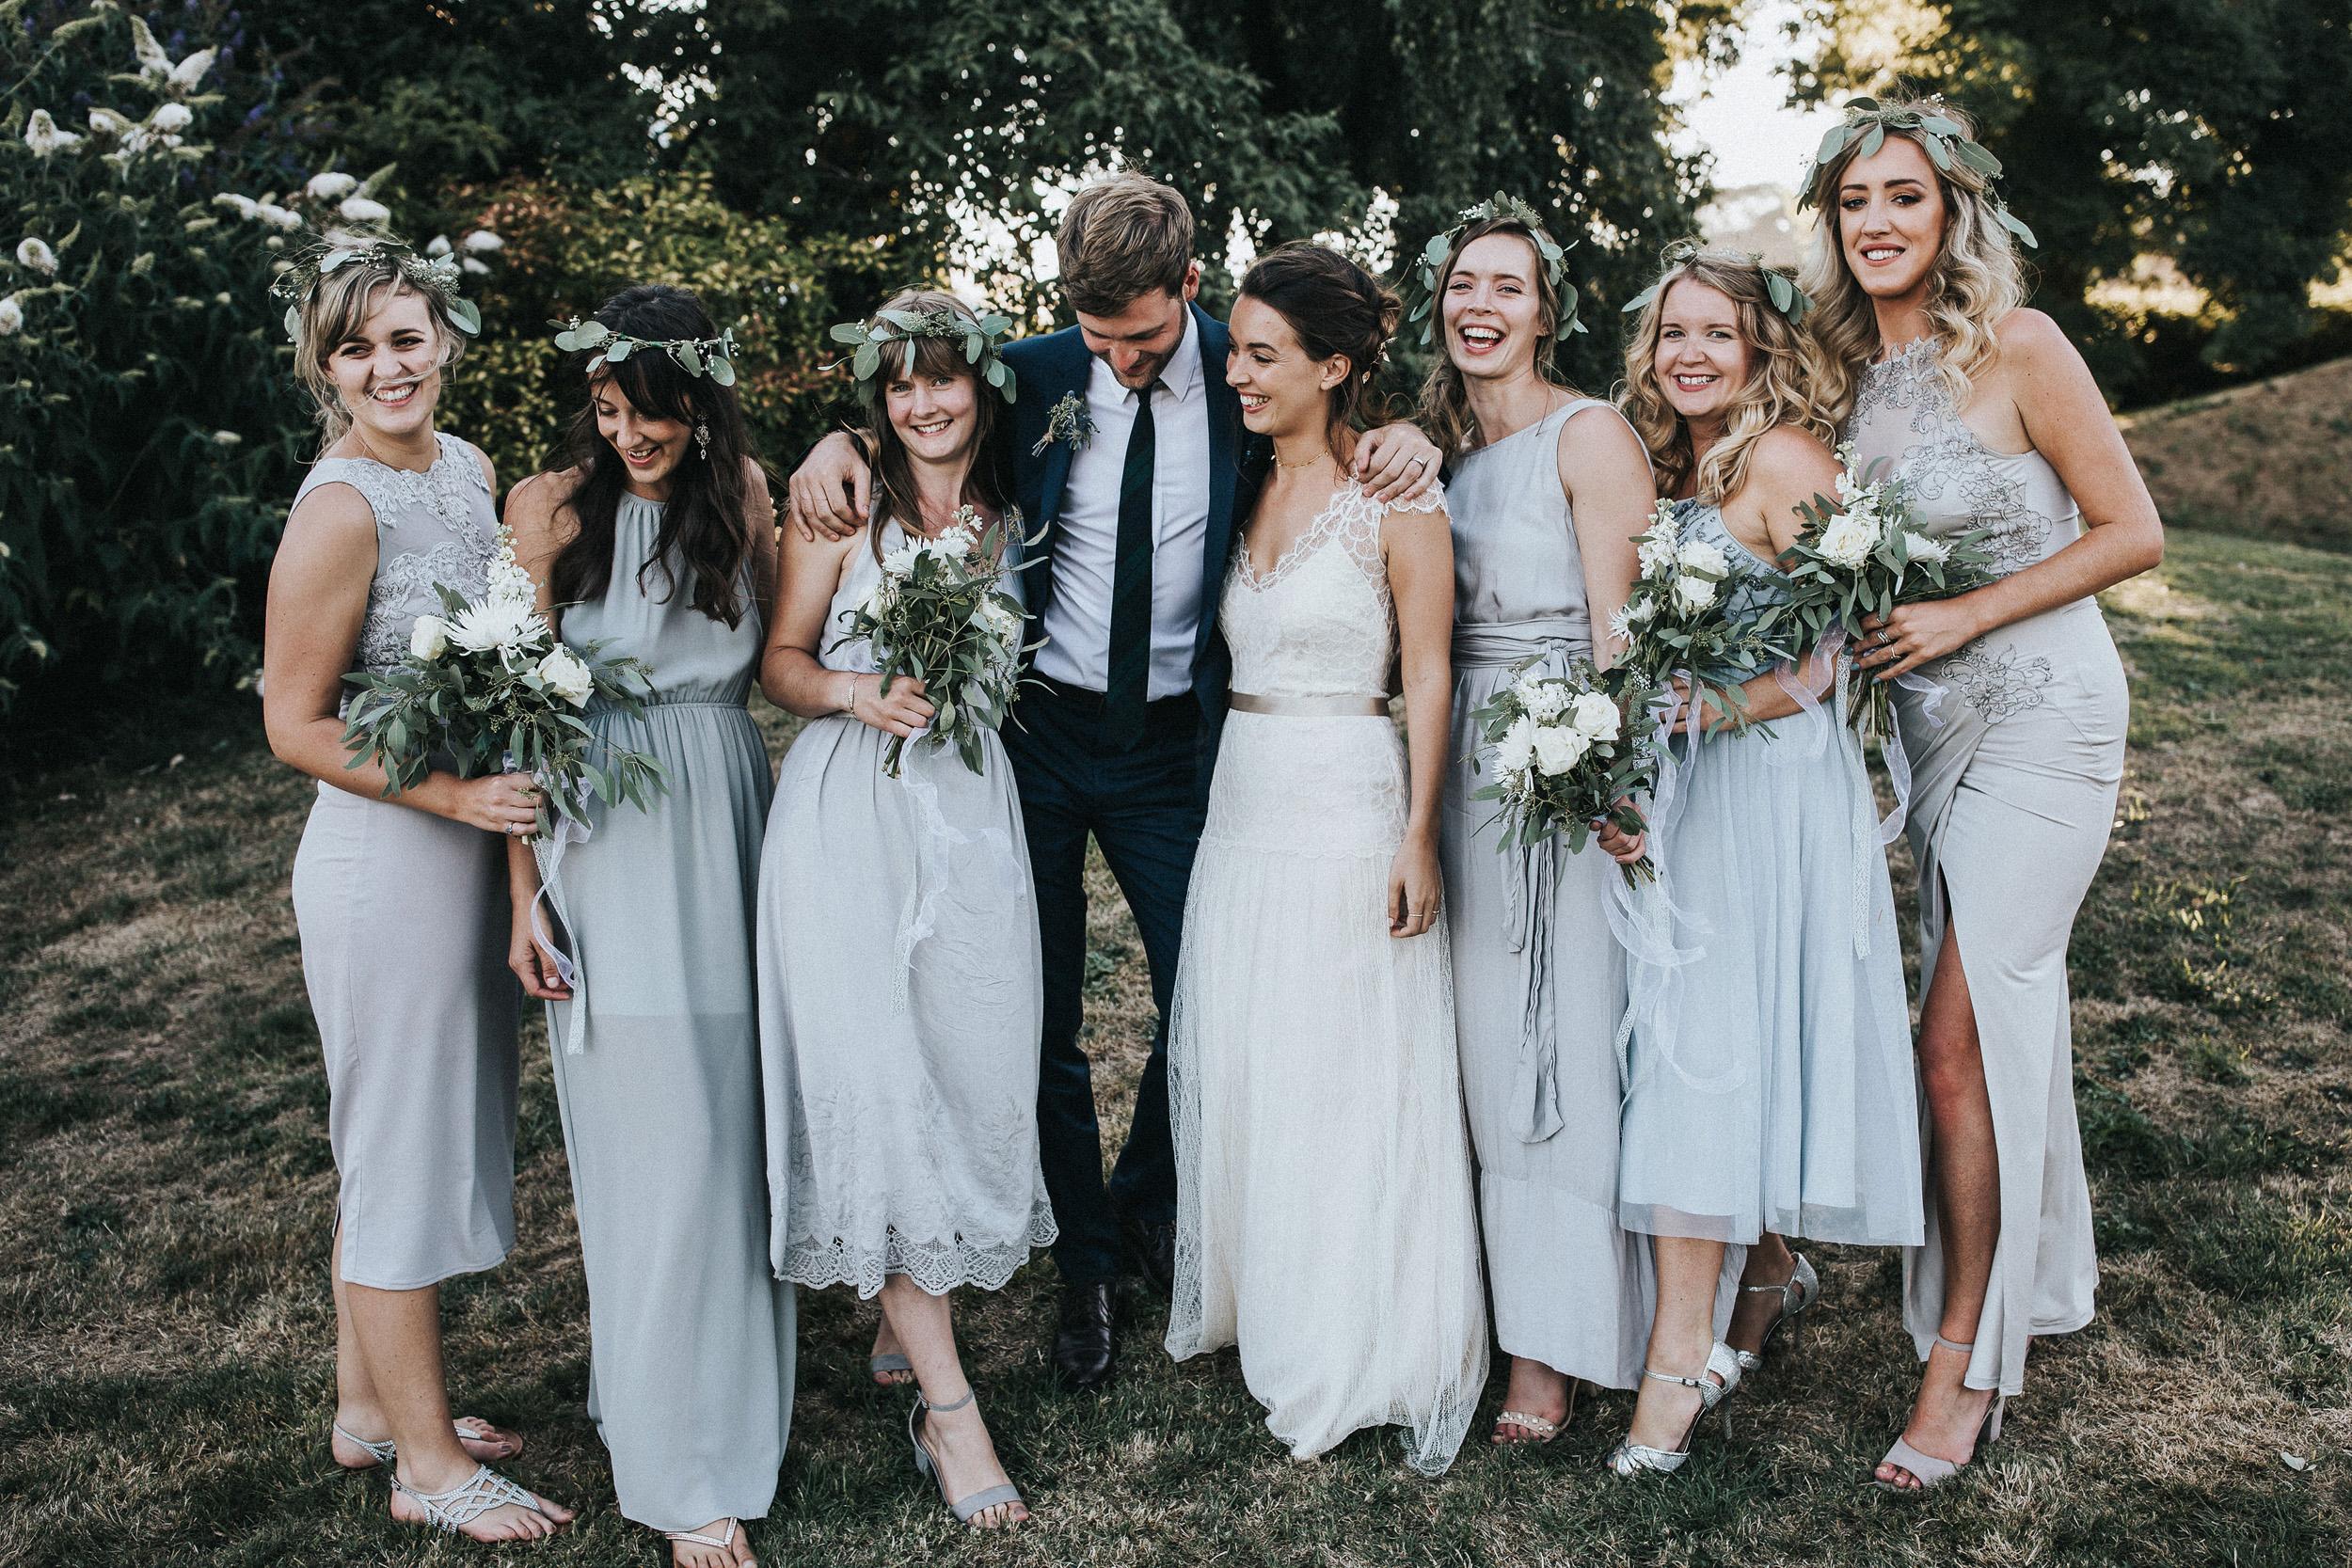 Martha-Laid-Back-Garden-Wedding-Lace-Wedding-Dress-Bohemian-Kate-Beaumont-44.jpg